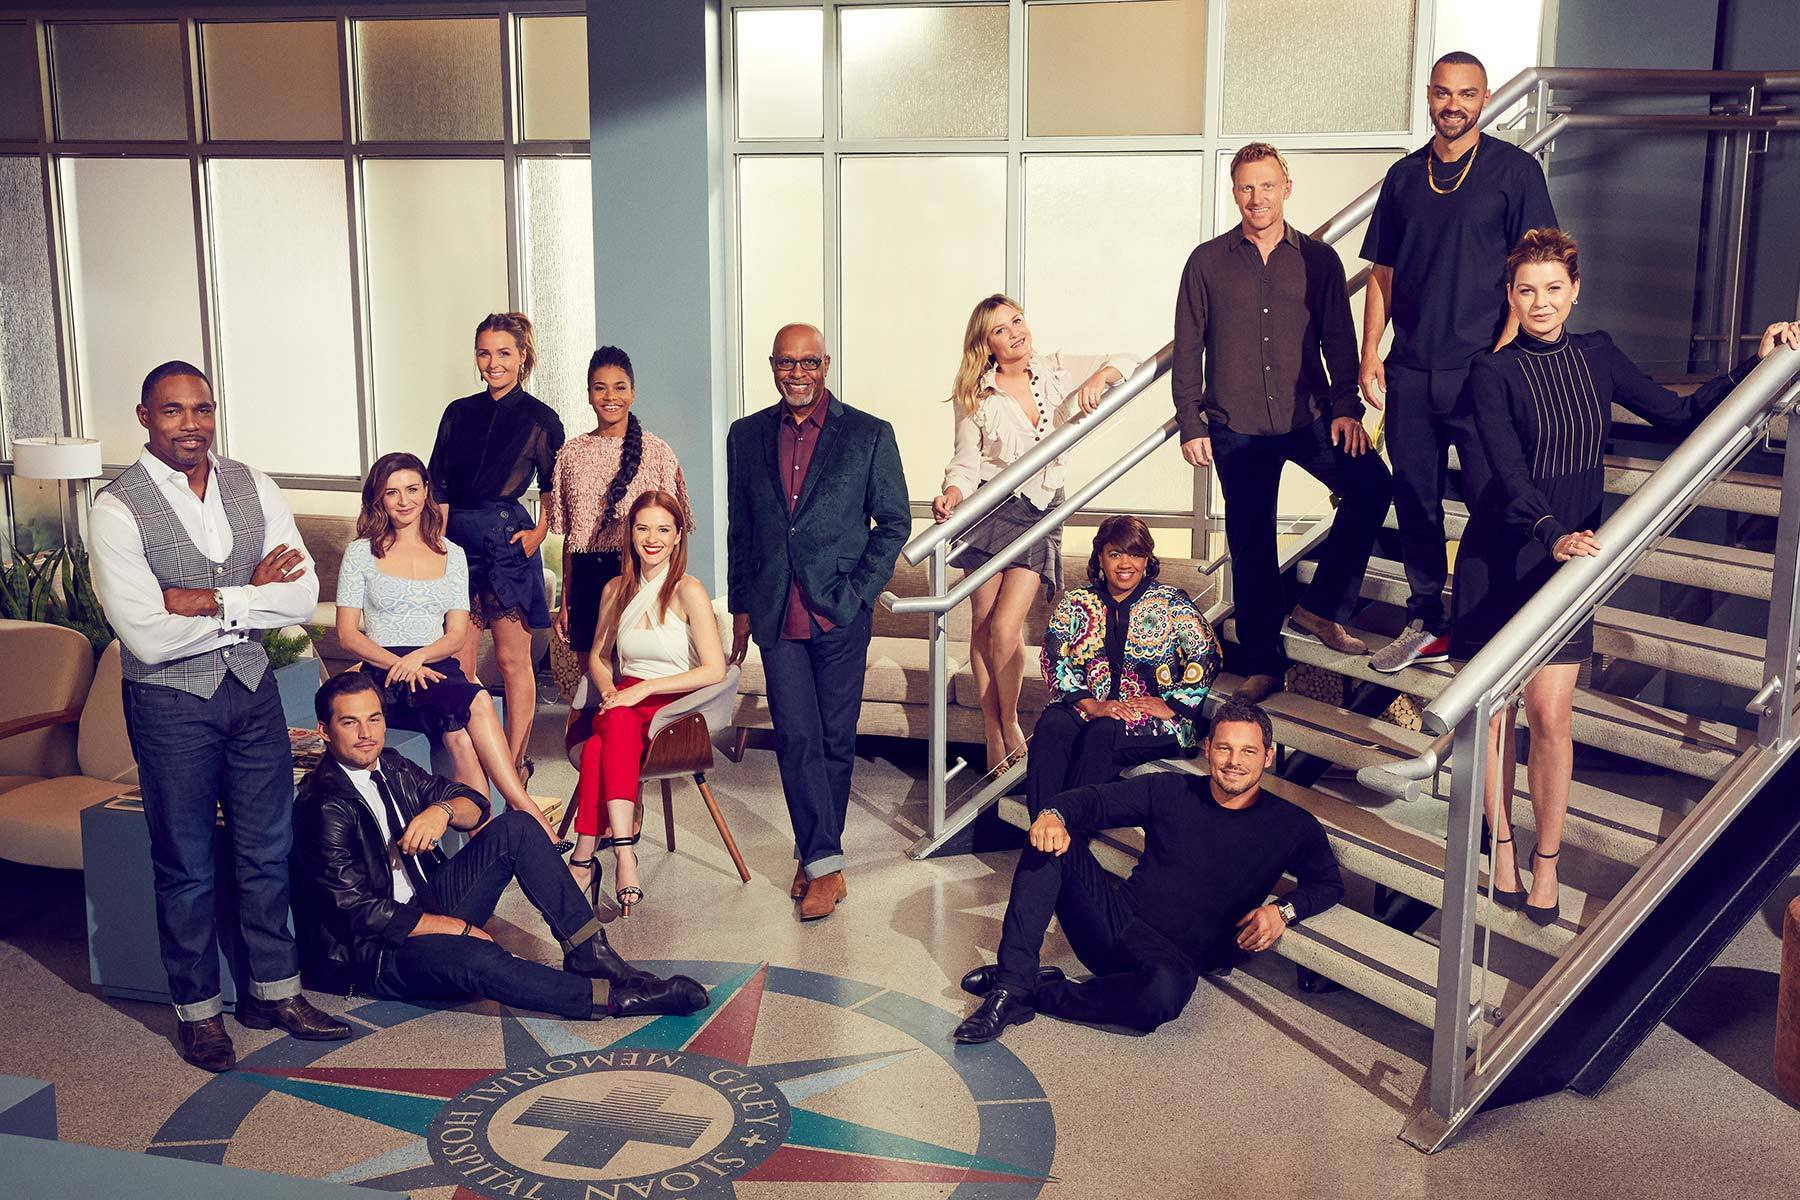 Greys Anatomy Cast Christopher Patey Photographer